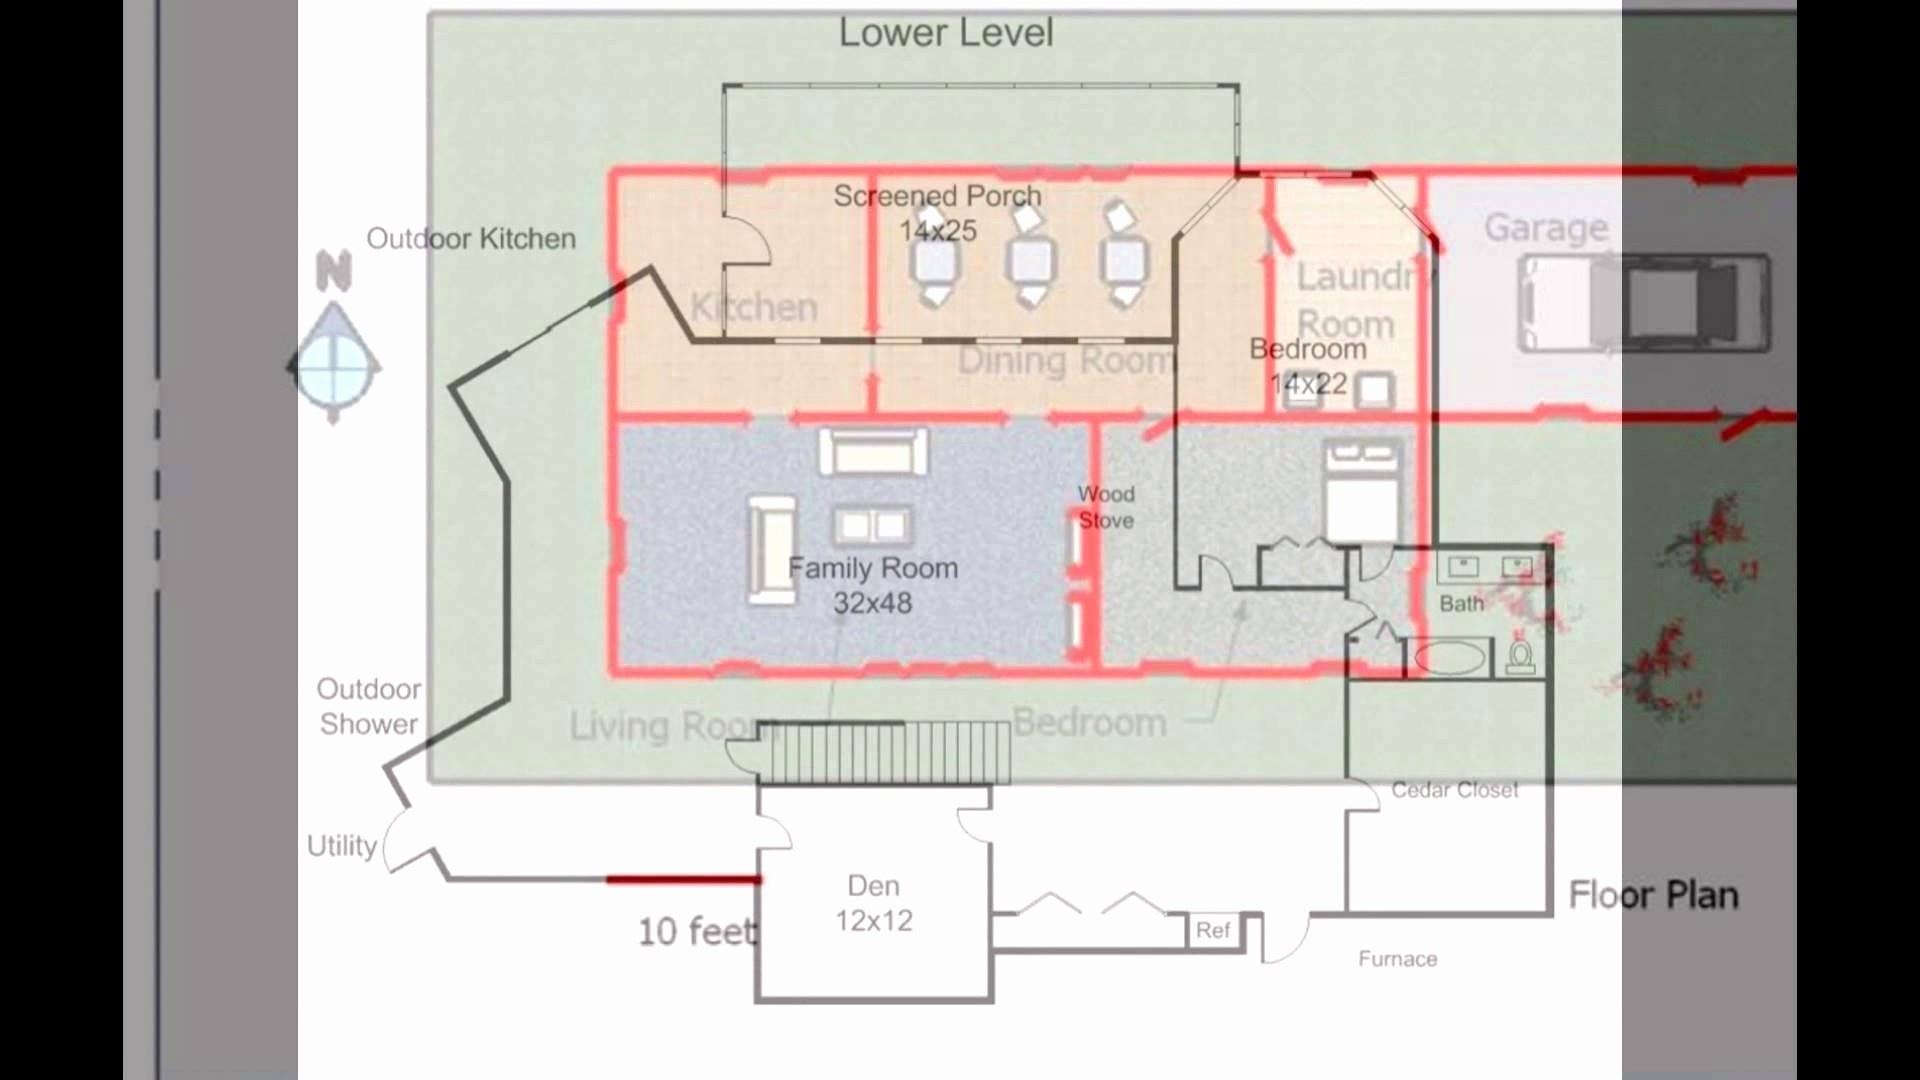 33 Beautiful Purple Martin Bird House Plan Wallpaper – Floor Plan Design - Free Printable Purple Martin House Plans